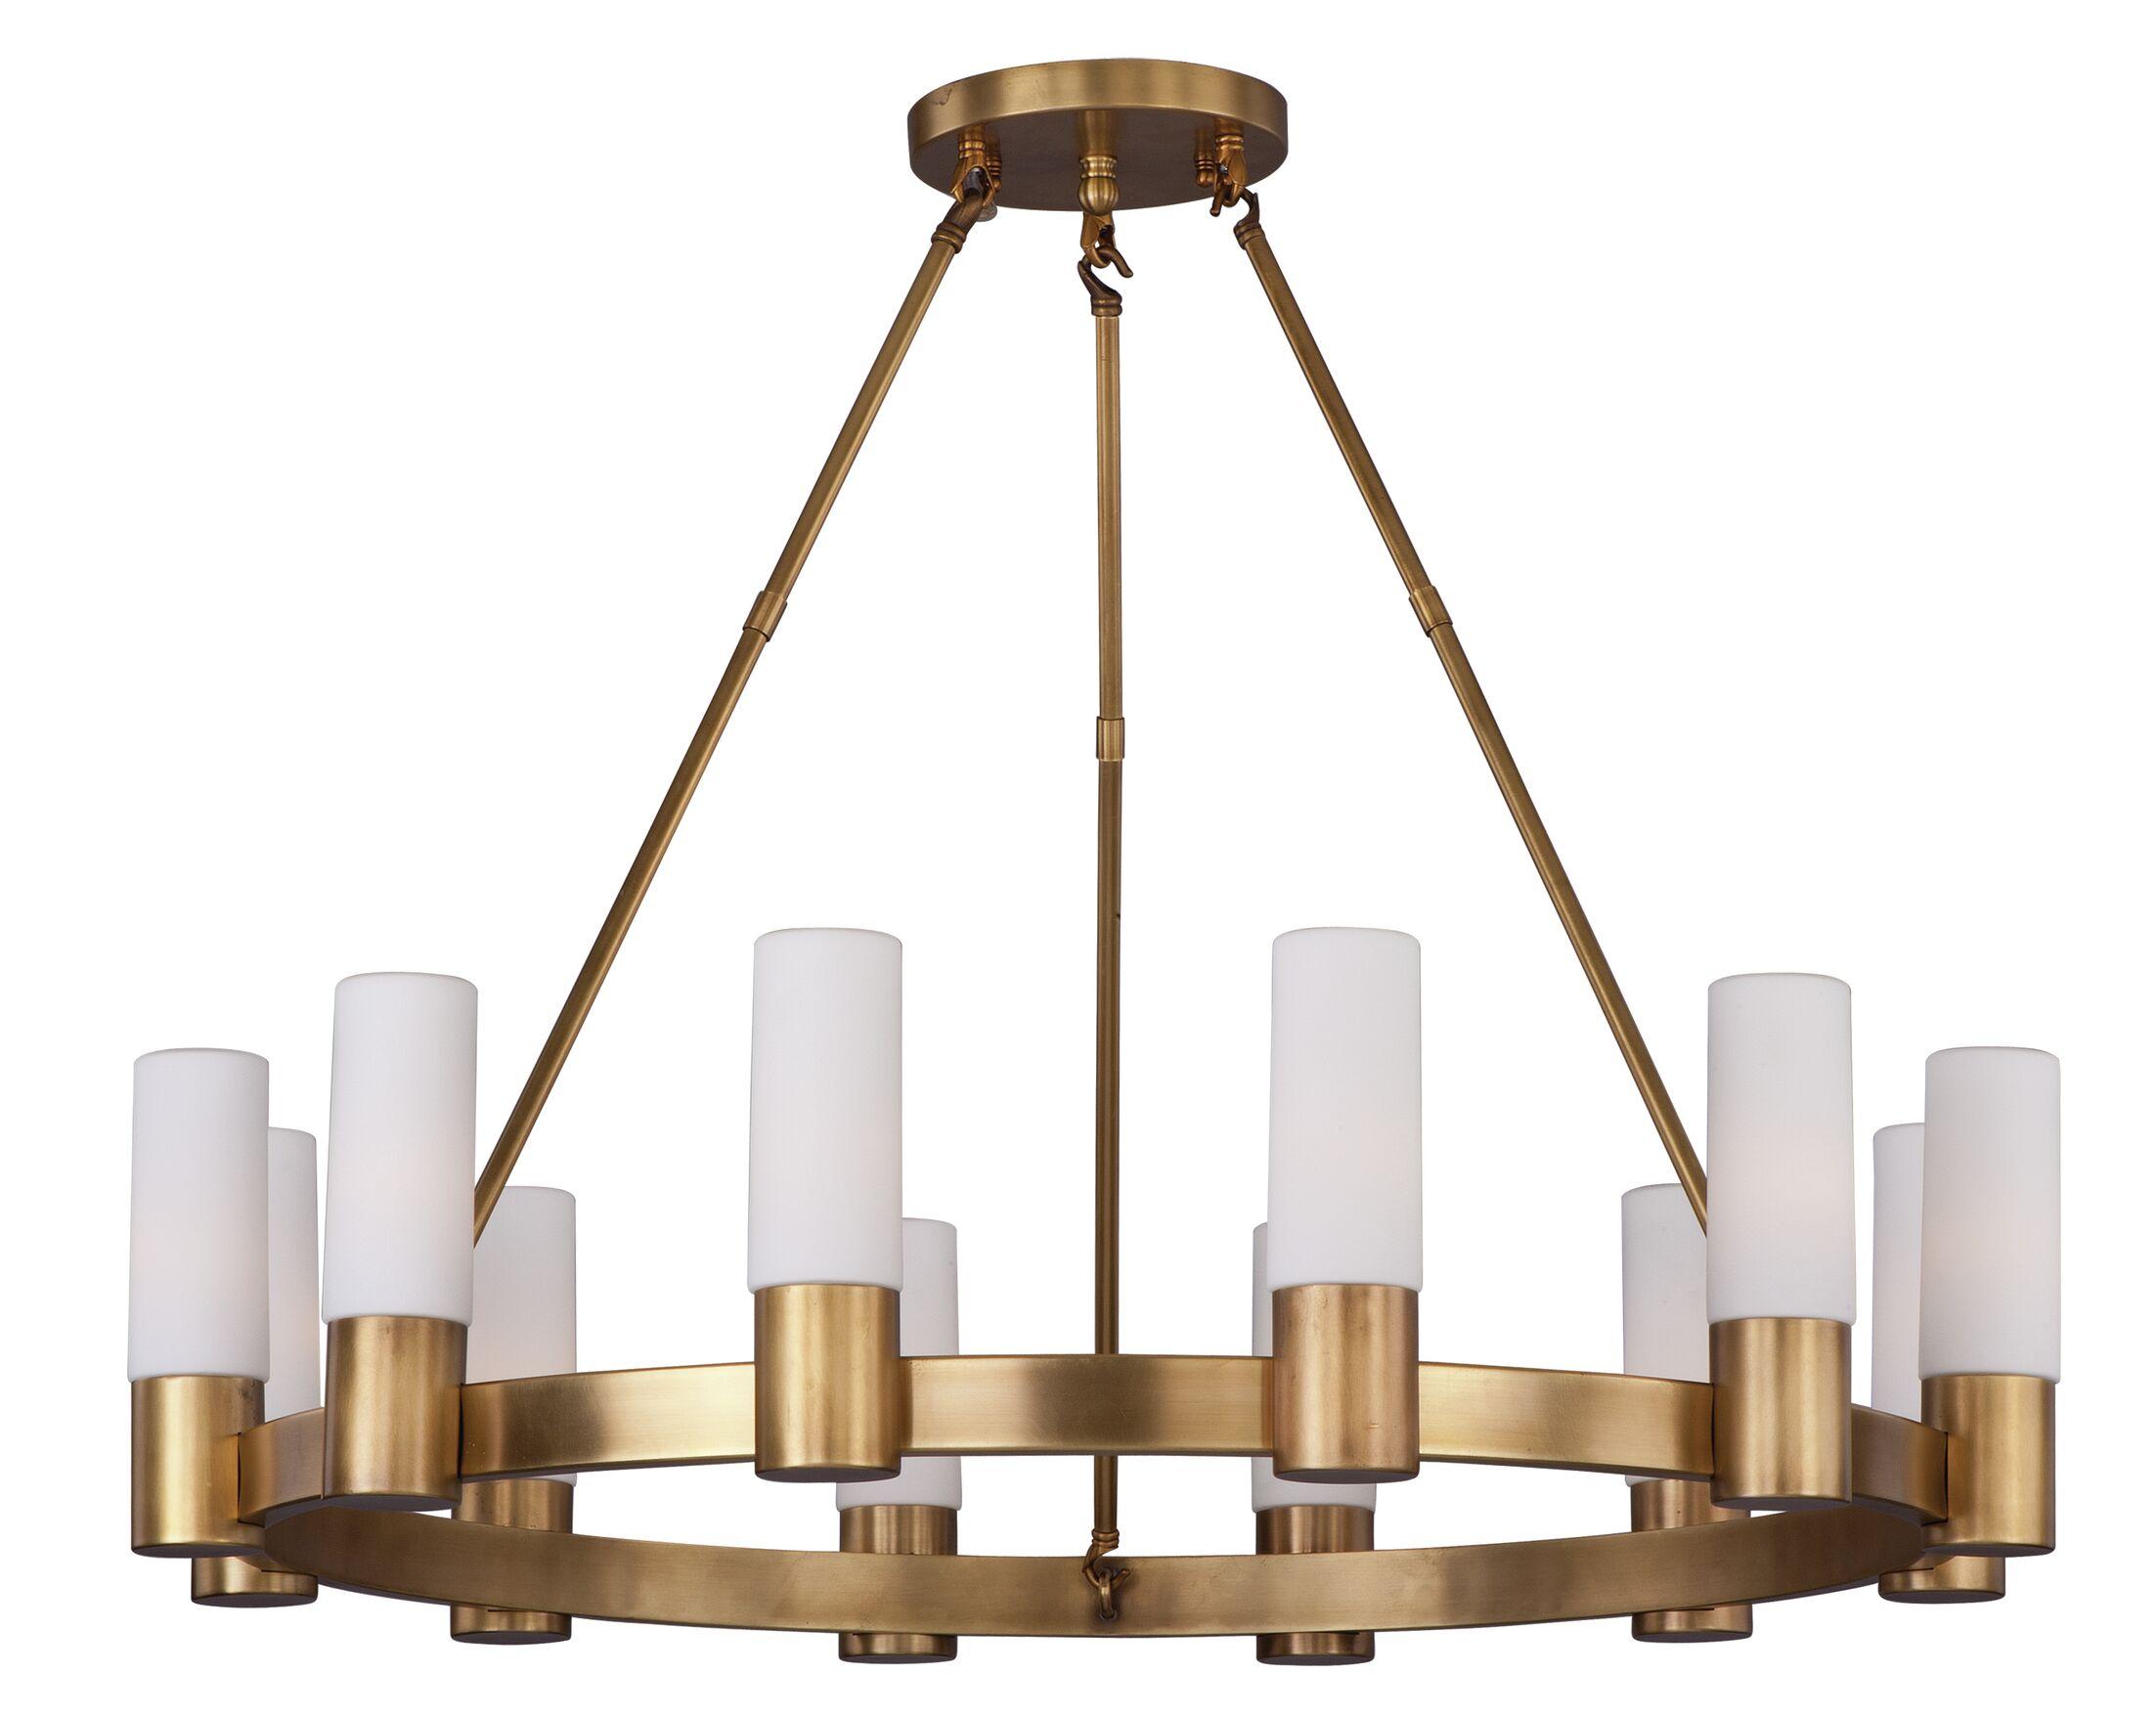 Roche 12-Light Shaded Chandelier